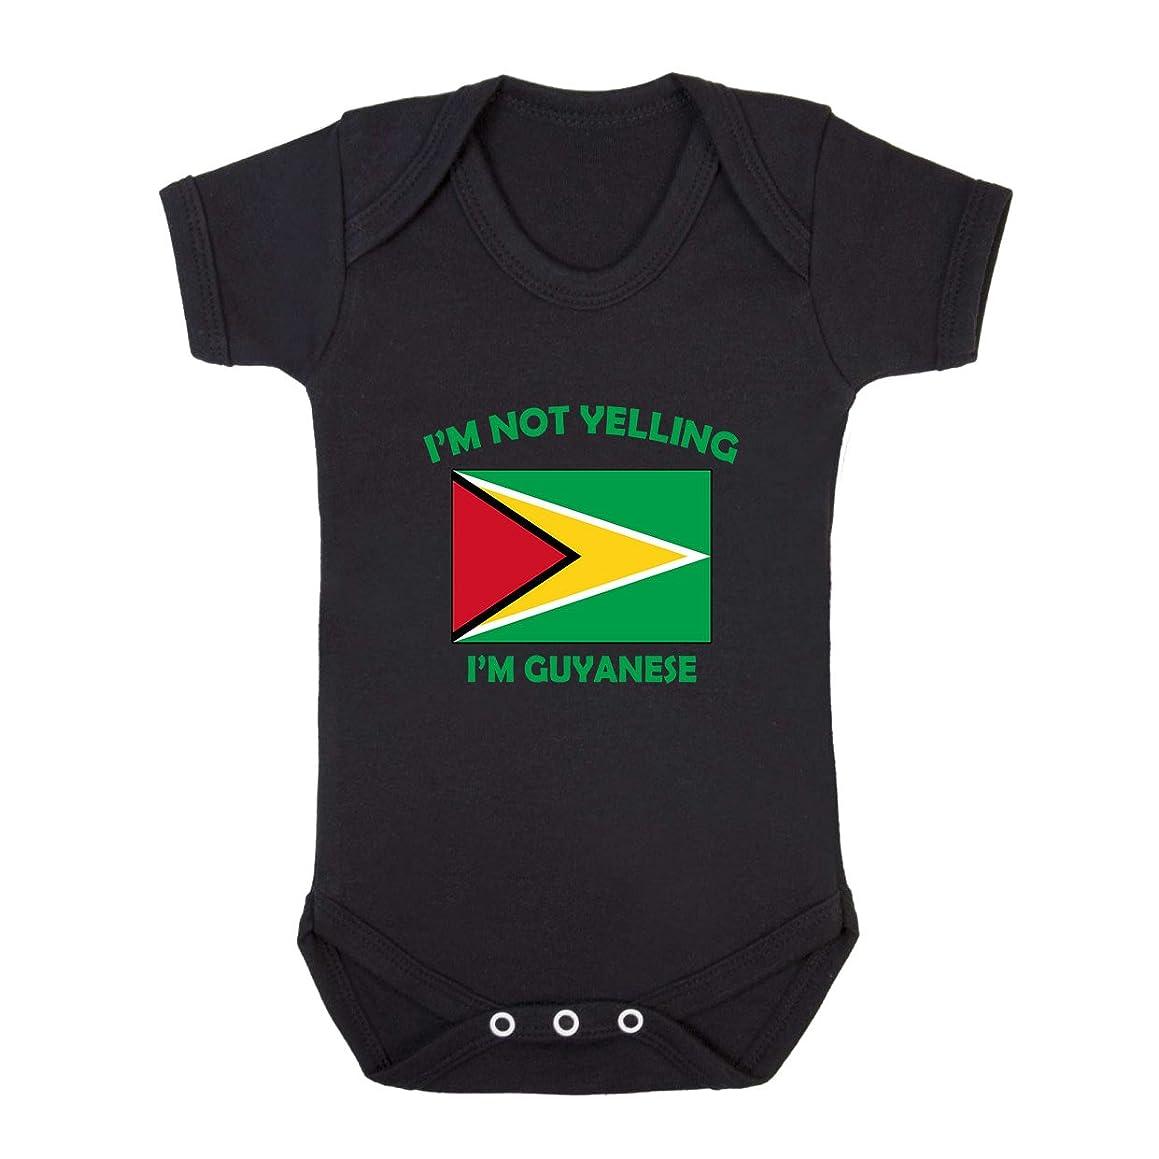 I'm Not Yelling, I Am Guyanese Guyana Baby Bodysuit One Piece Black Newborn